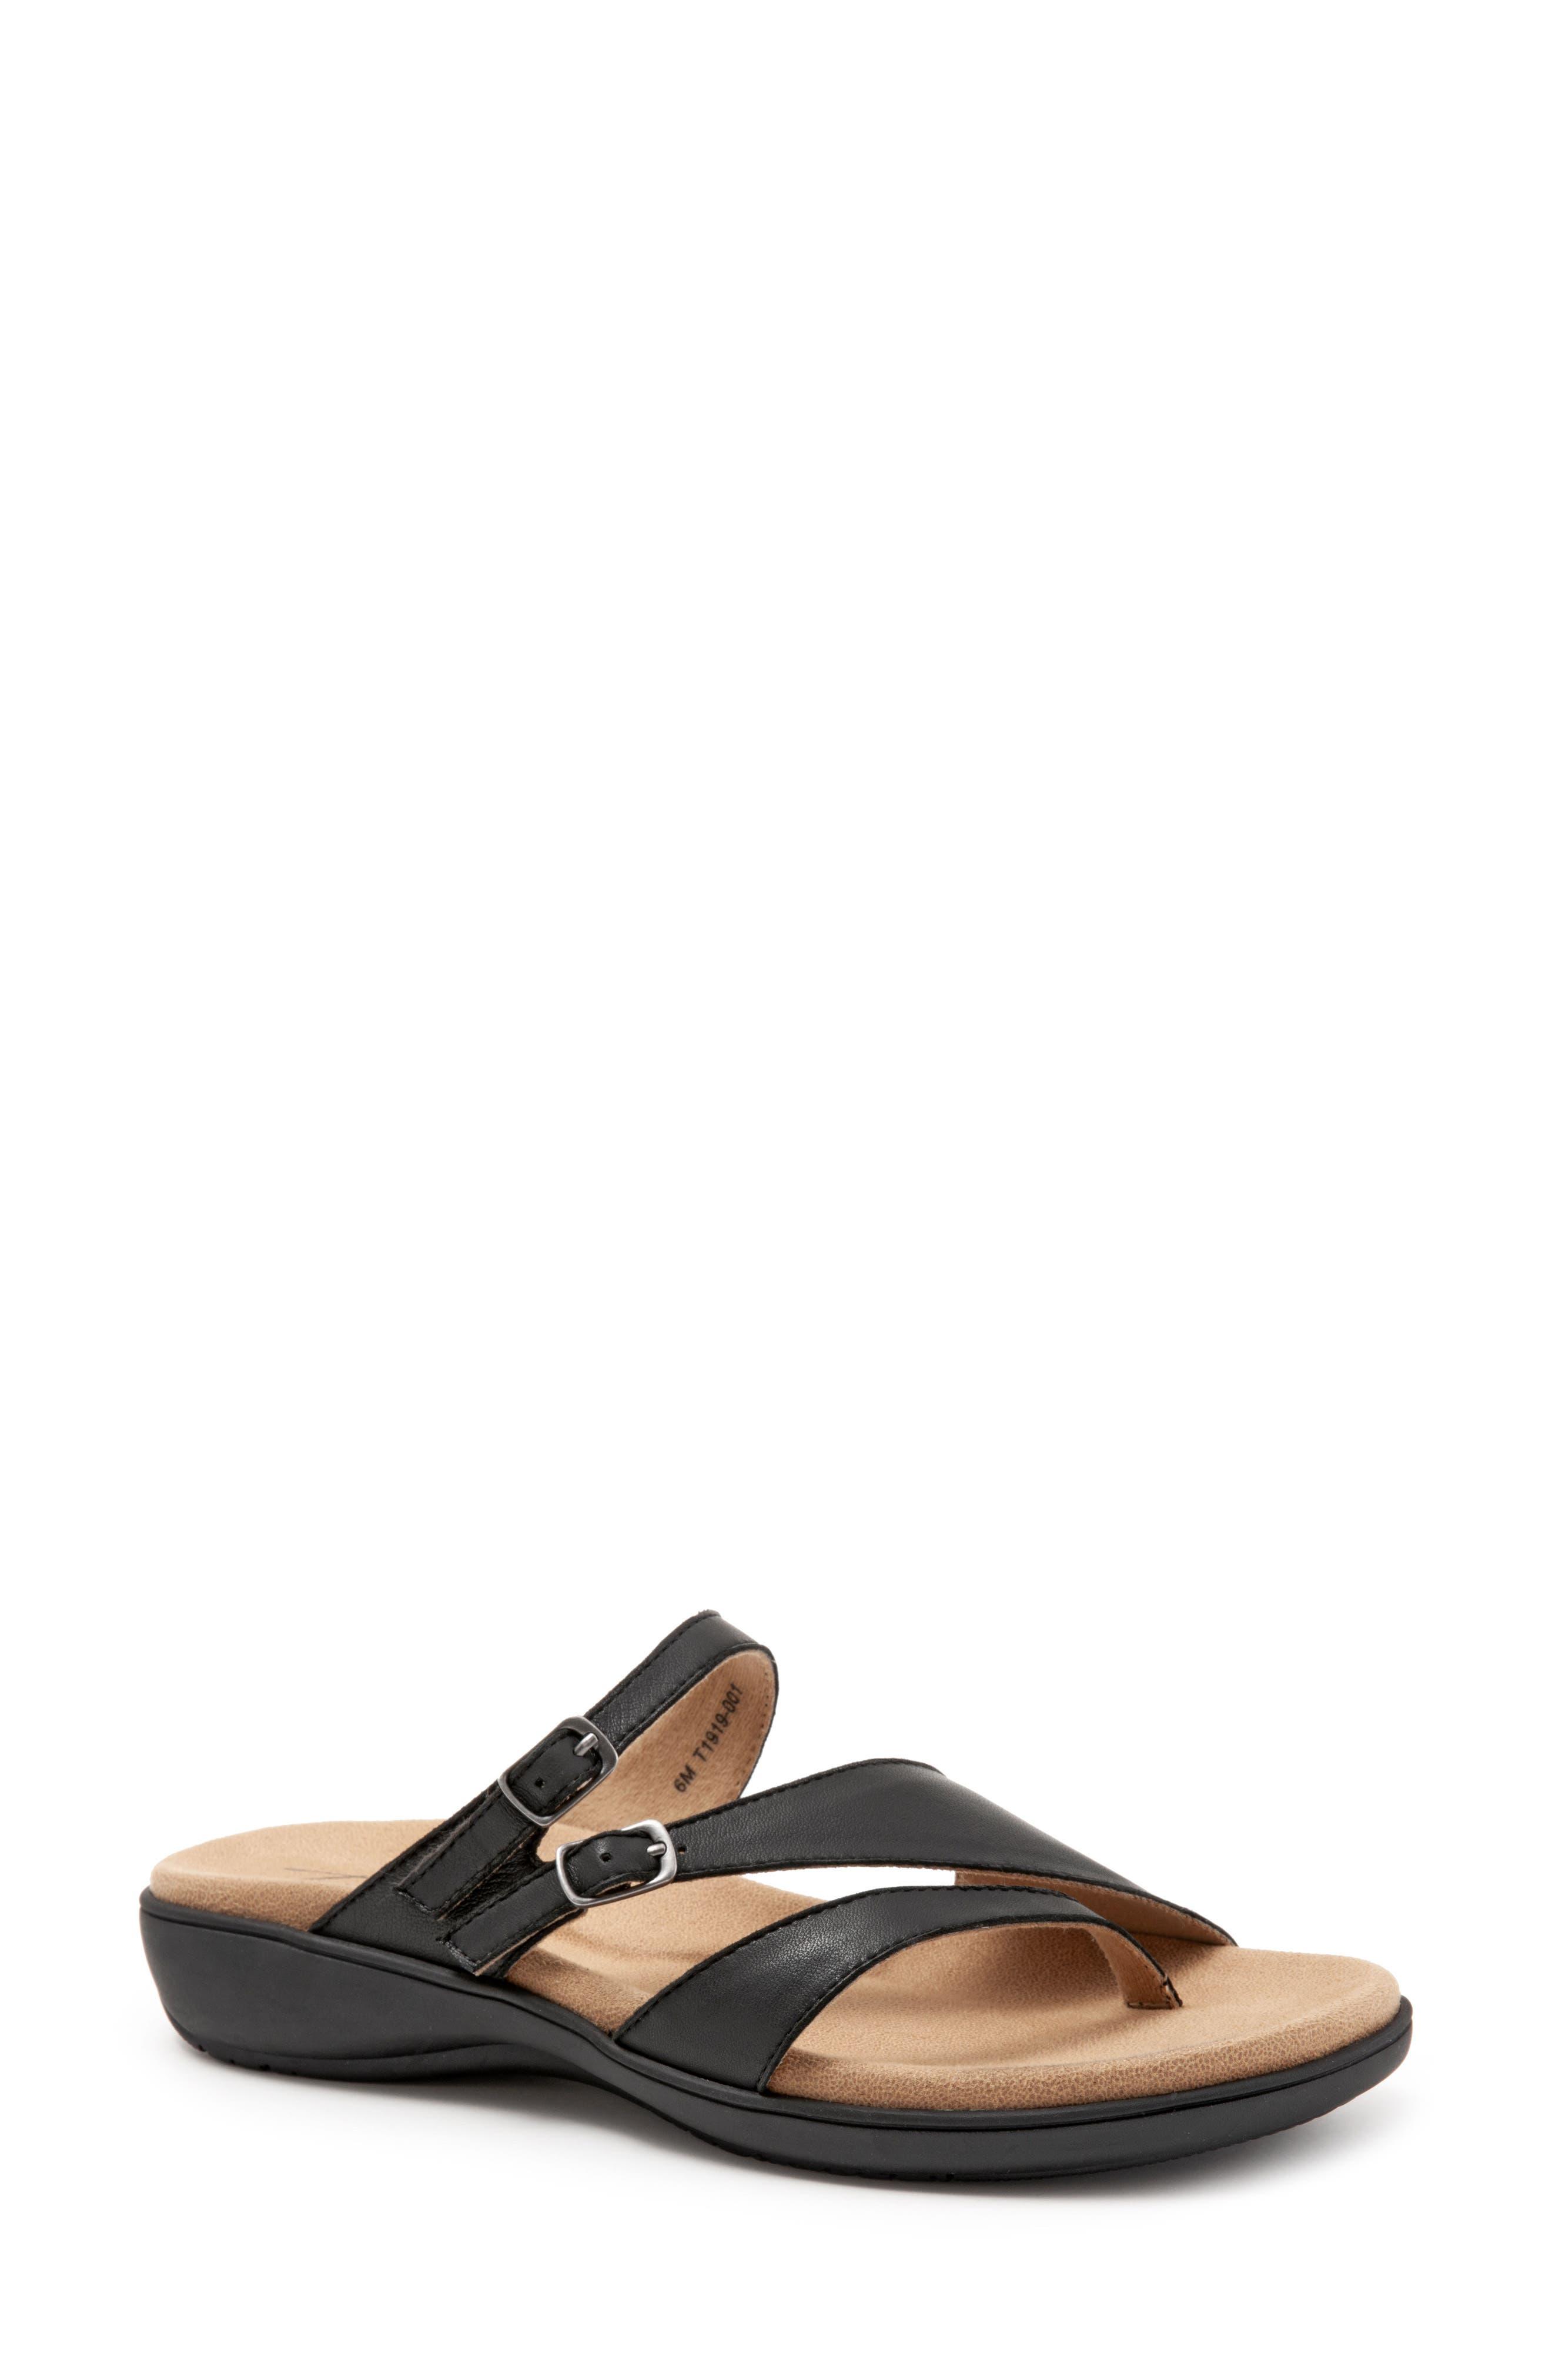 TROTTERS Vanna Slide Sandal, Main, color, BLACK LEATHER